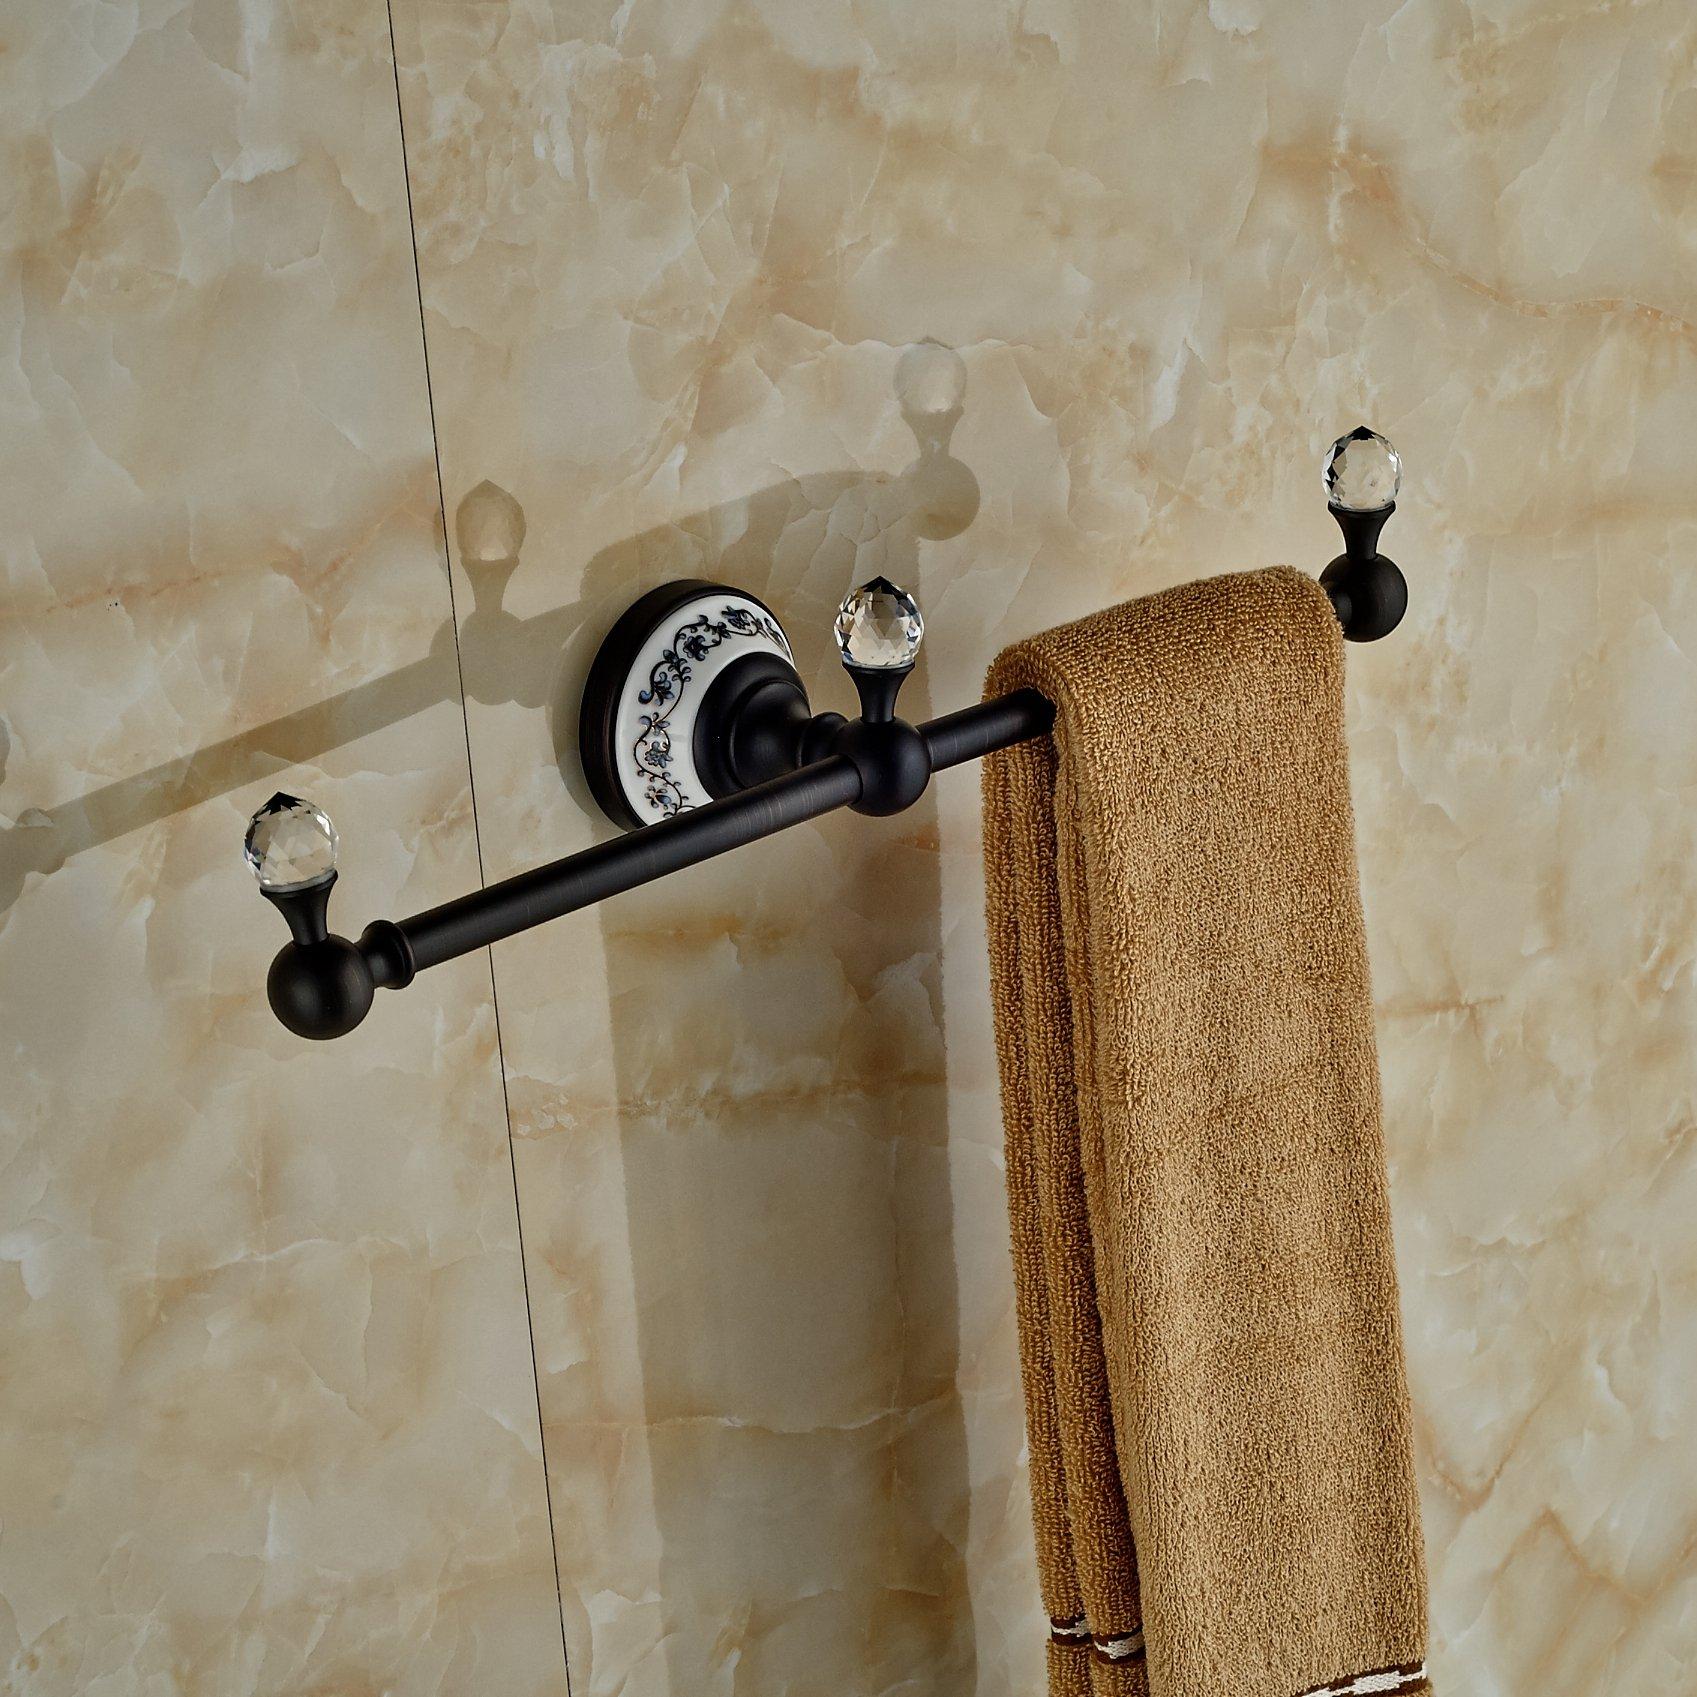 Luxury Crystal Deco Bath Towel Bar Wall Mounted Towel Rac Hanger (Oil Rubbed Bronze) by Rozin (Image #9)